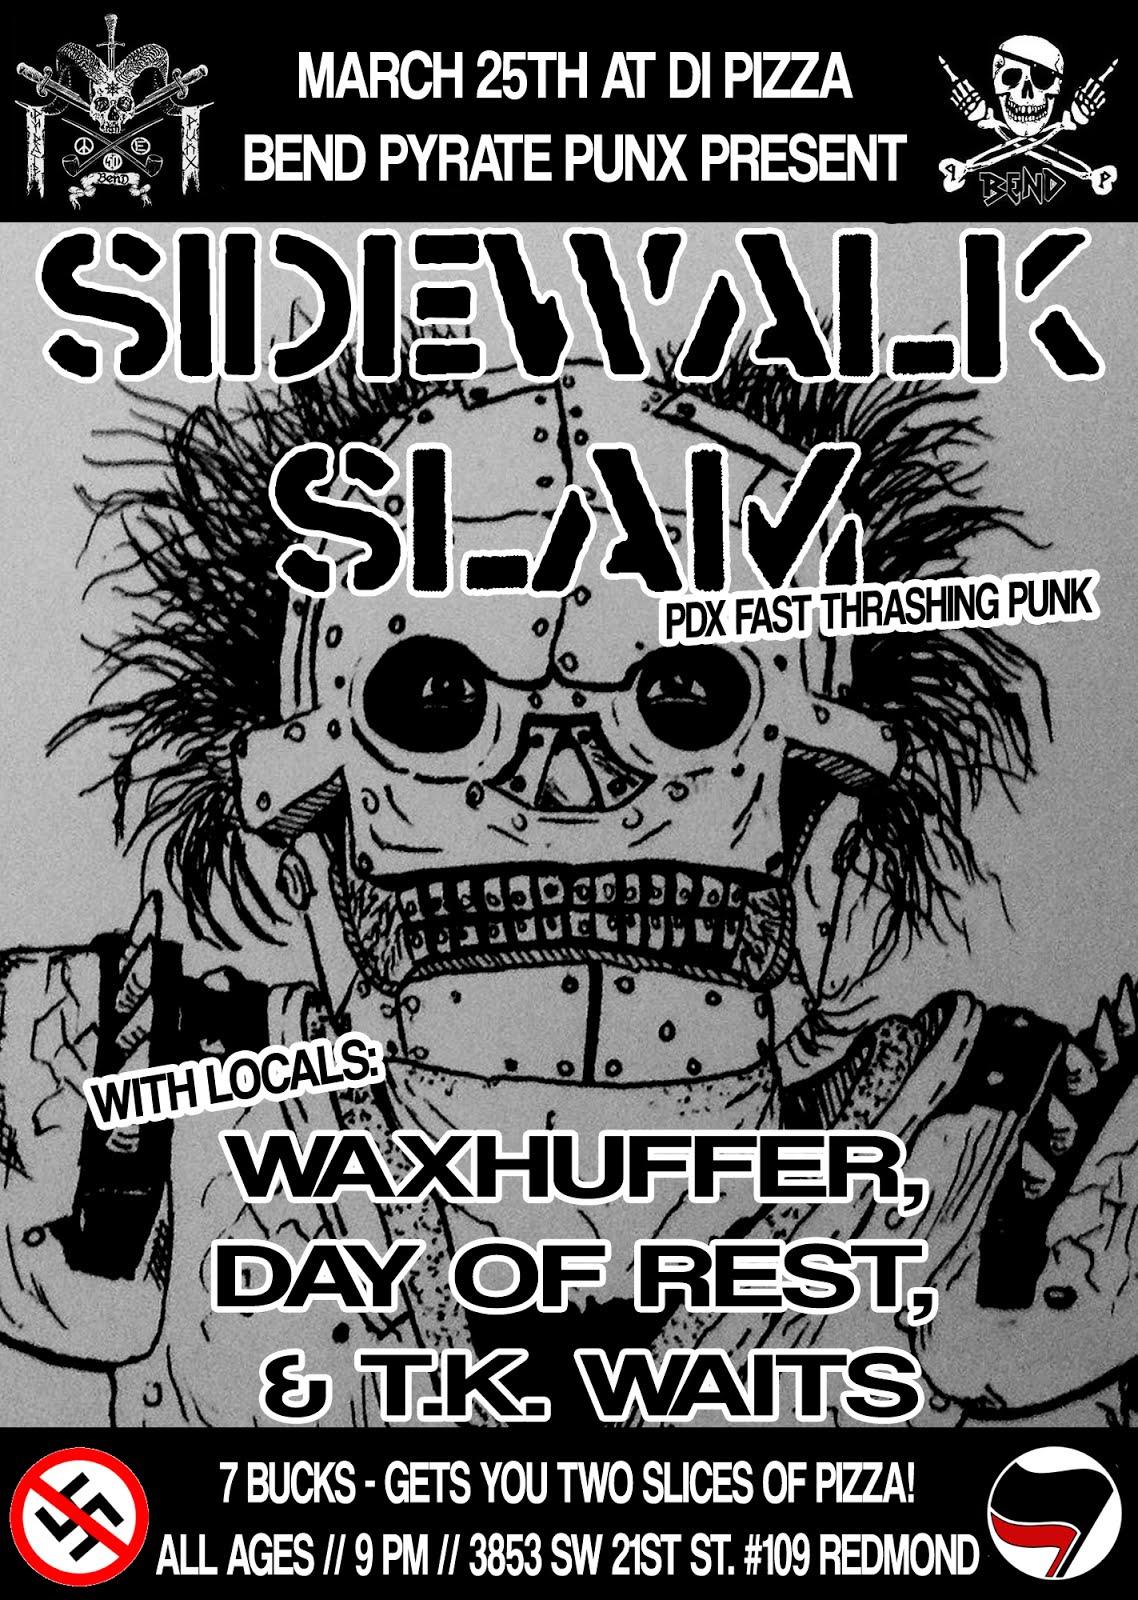 SIDEWALK SLAM, WAXHUFFER, DAY OF REST, AND T.K. WAITS